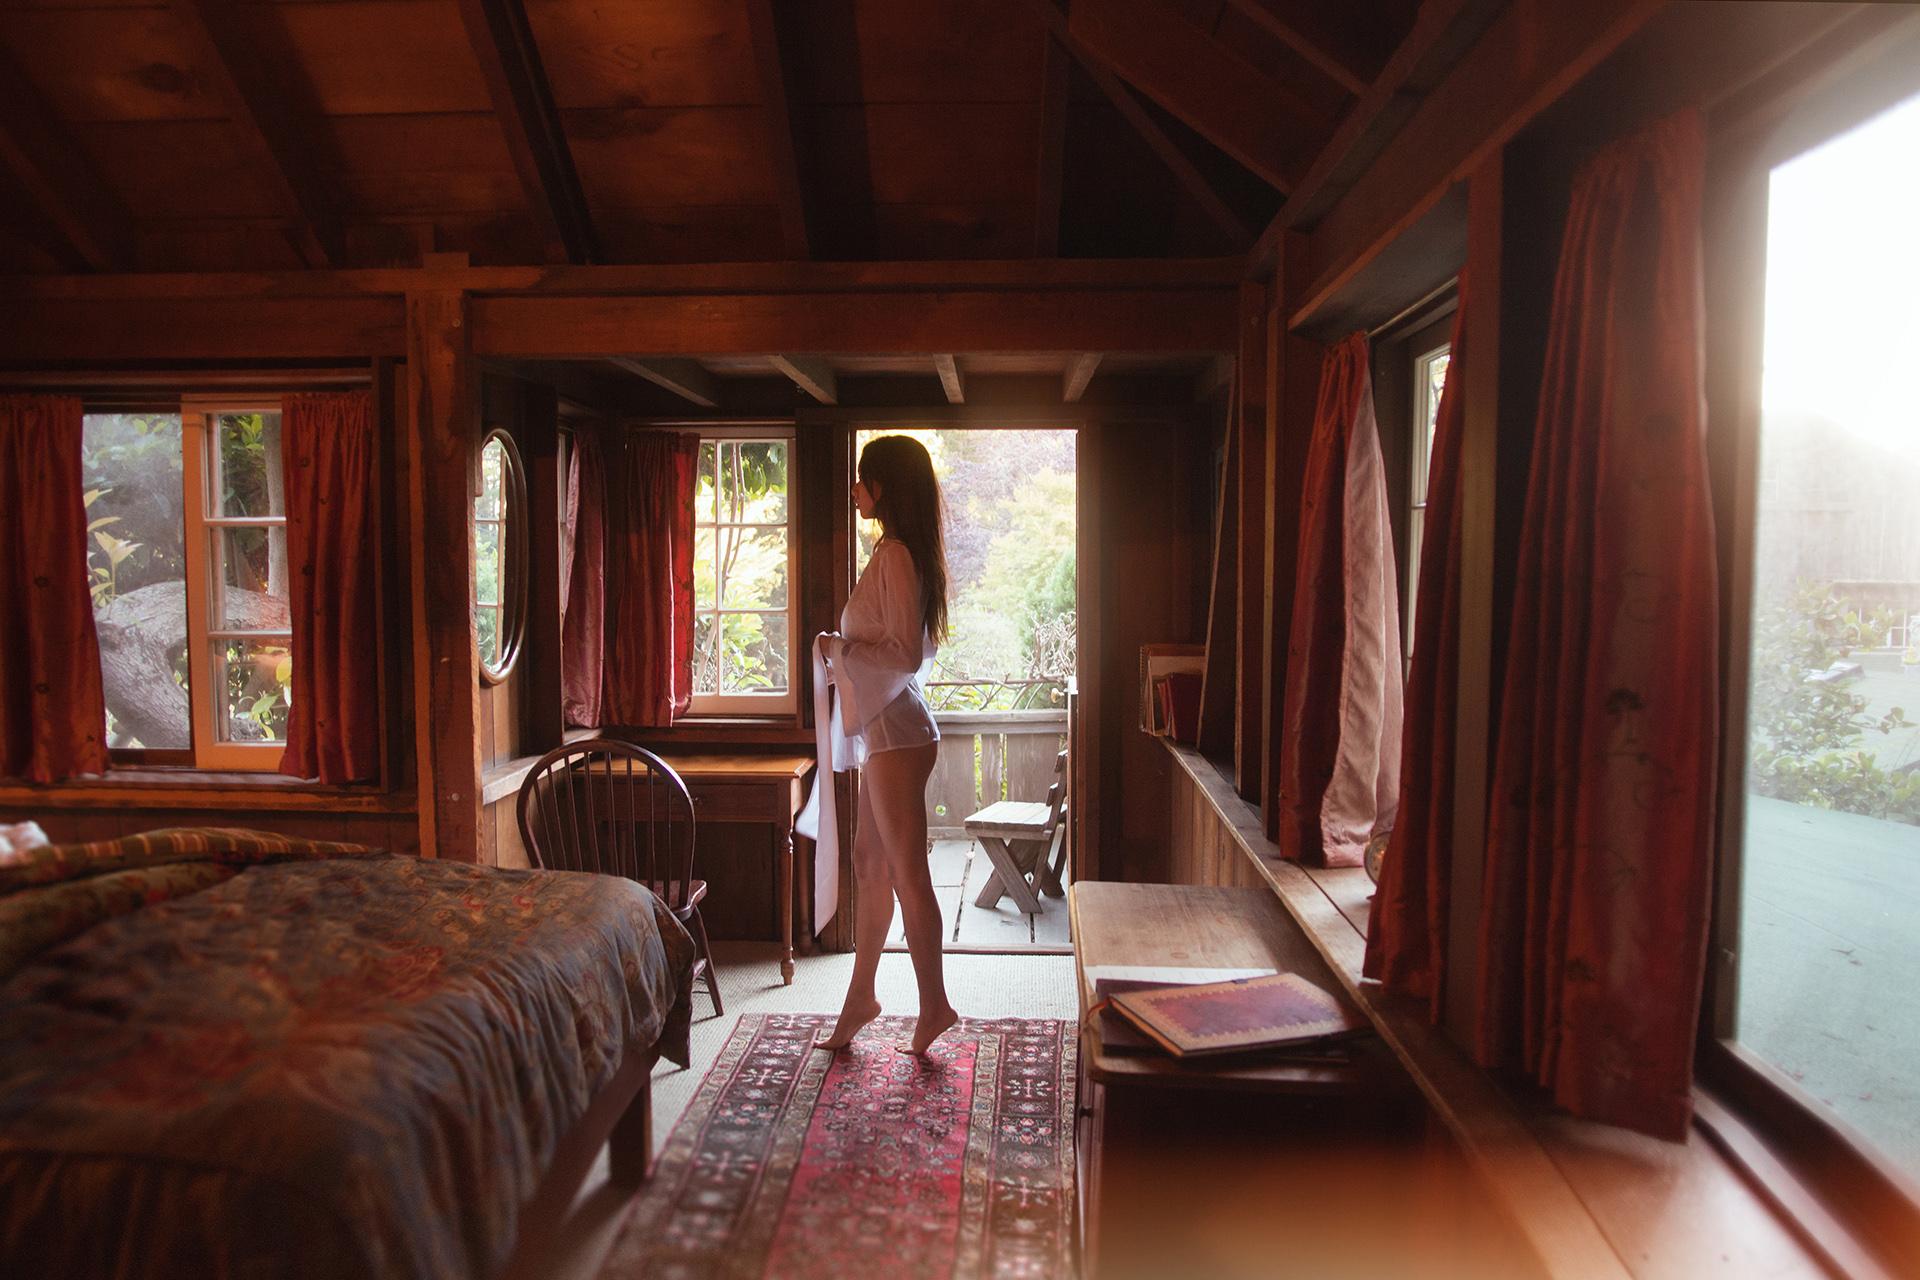 hamilton-photo-studio-the-lunar-loft-boudoir-studio-lingerie-04.jpg